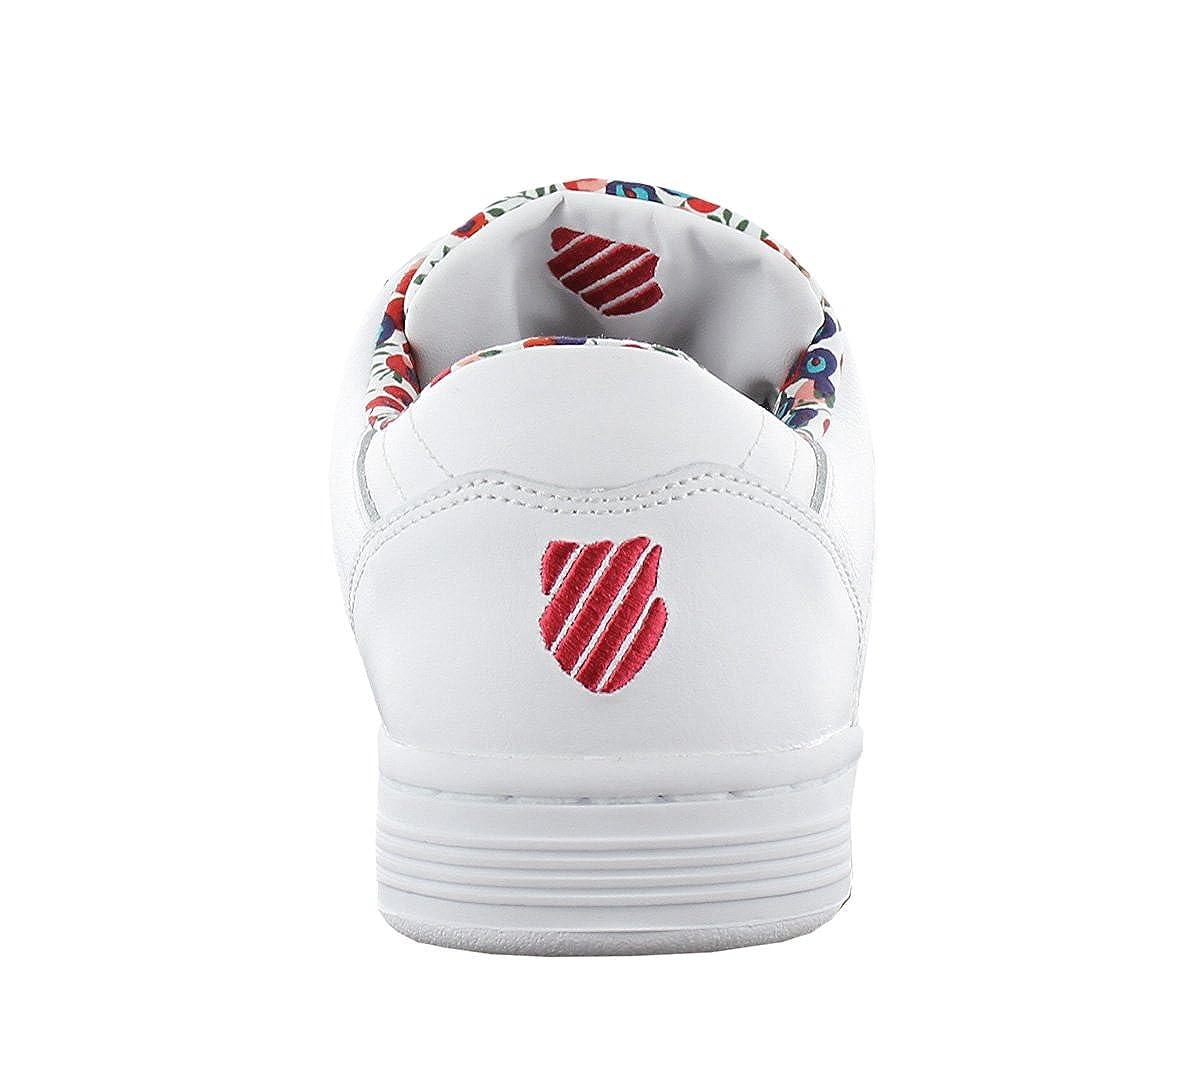 K-Swiss Lozan Damen III TT Liberty Damen Lozan Sneaker mit drehbarer Zunge – Limited Edition - Fashion Sneaker Turnschuhe Sportschuhe Mehrfarbig 9a70b9